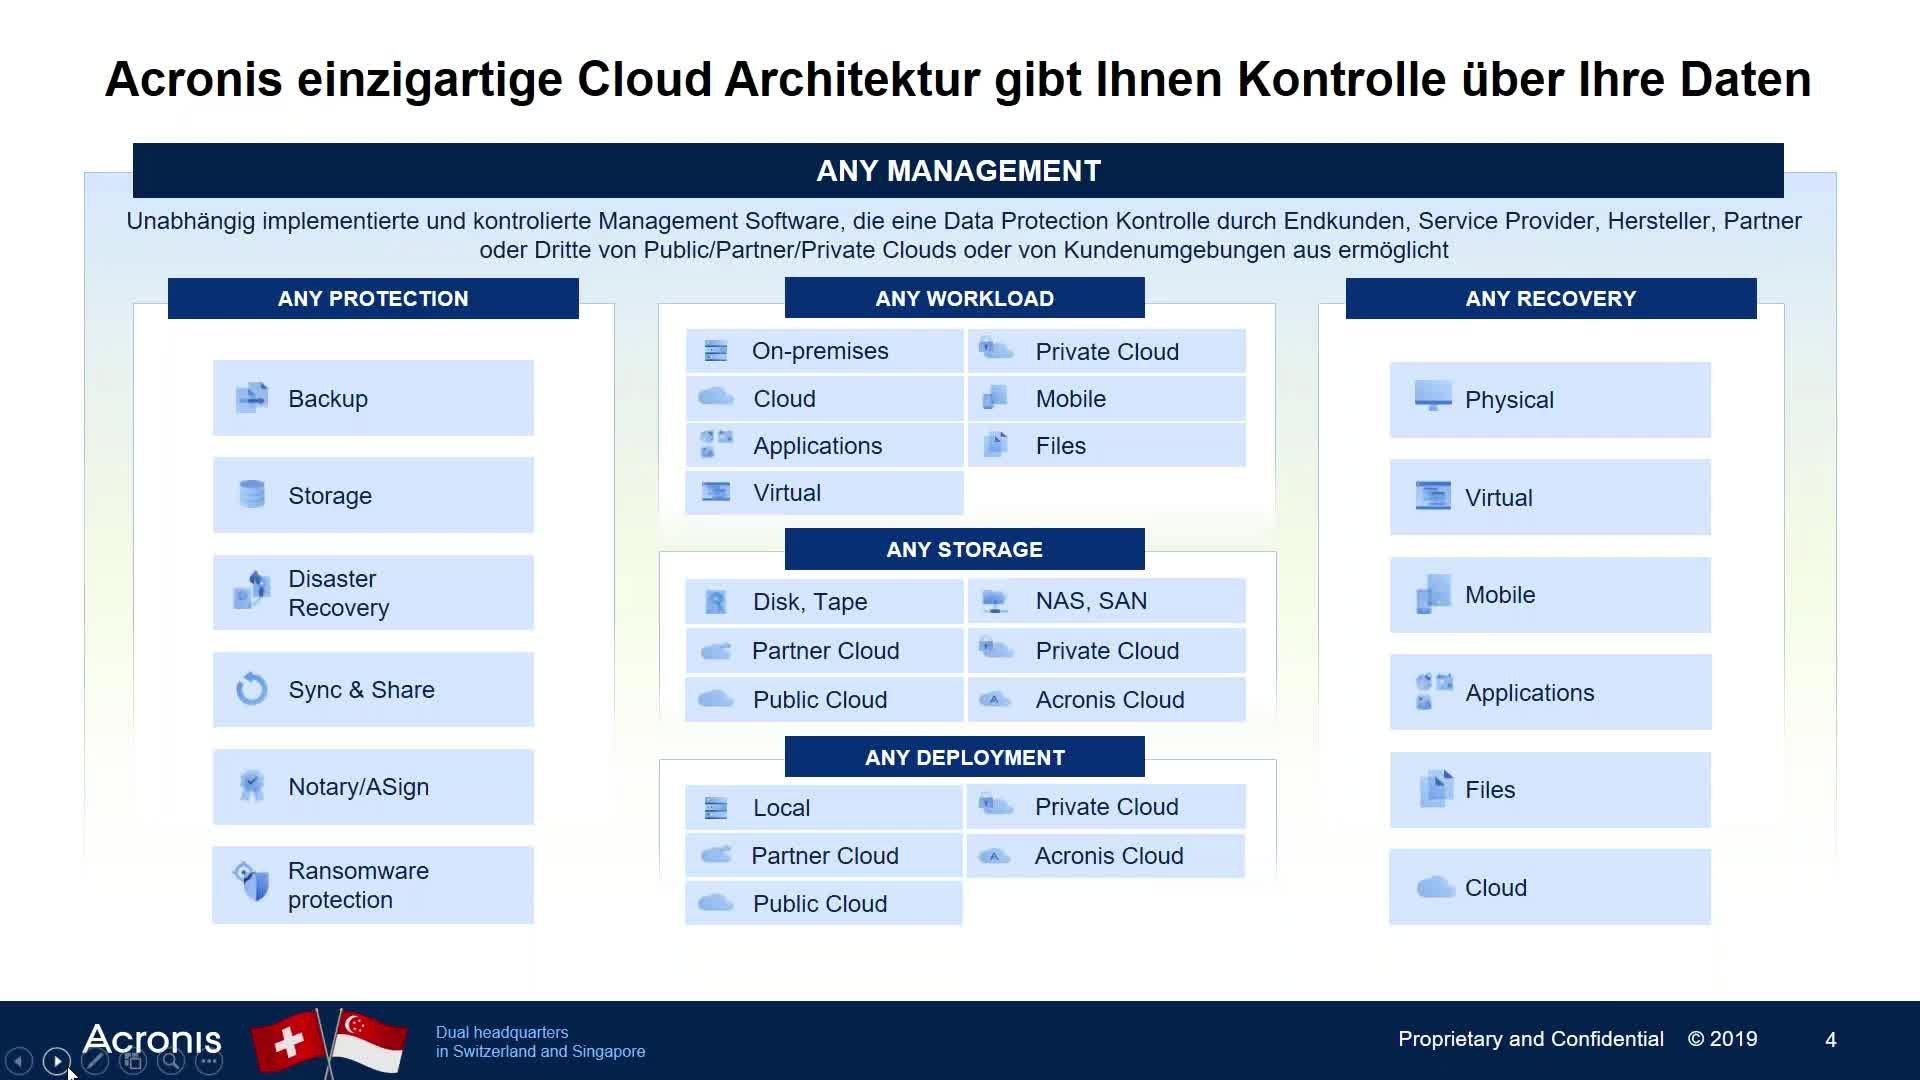 Acronis Webinar 14.10 mit CRN